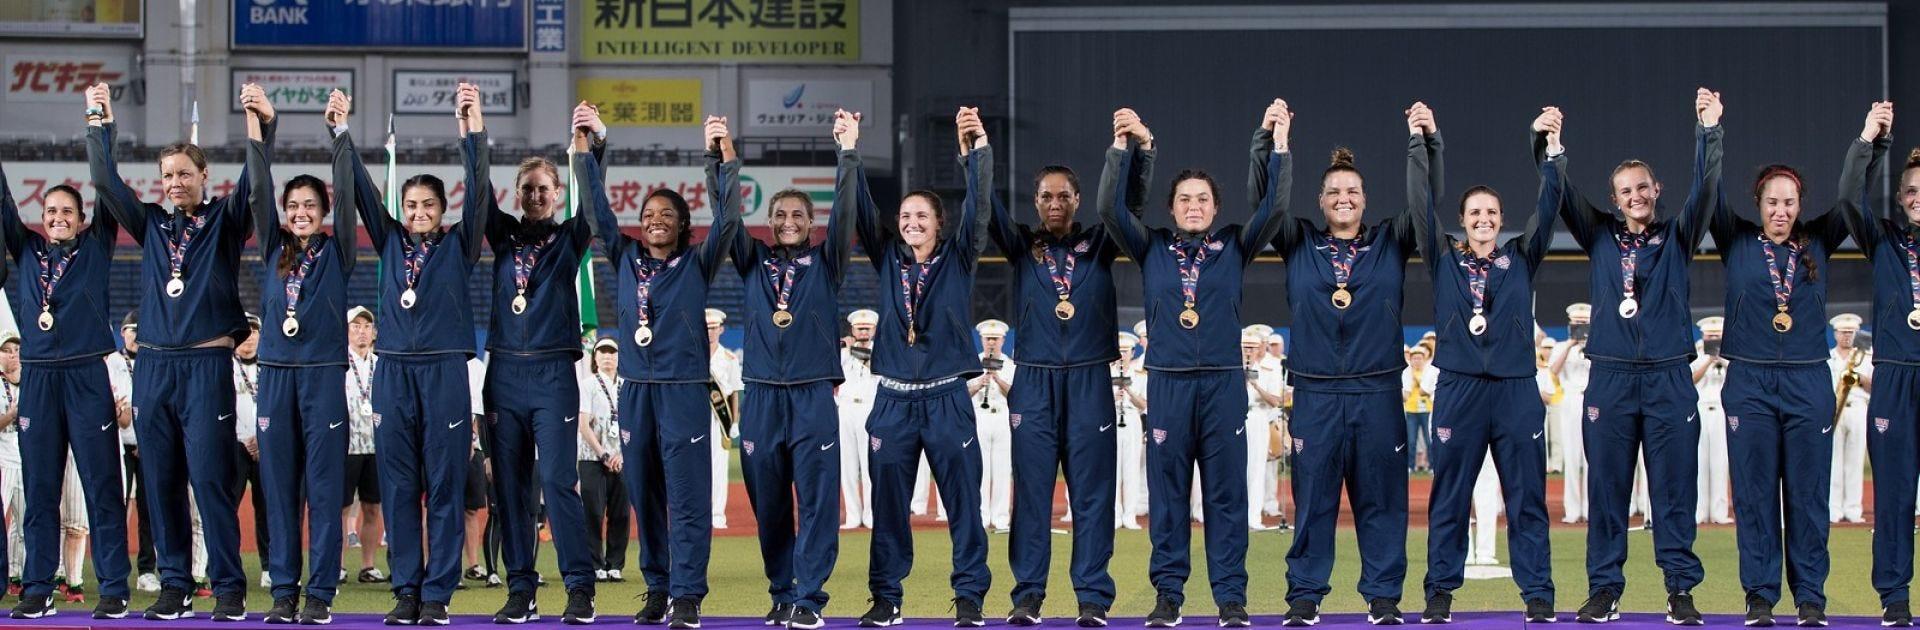 Team USA Softball celebrating on the podium